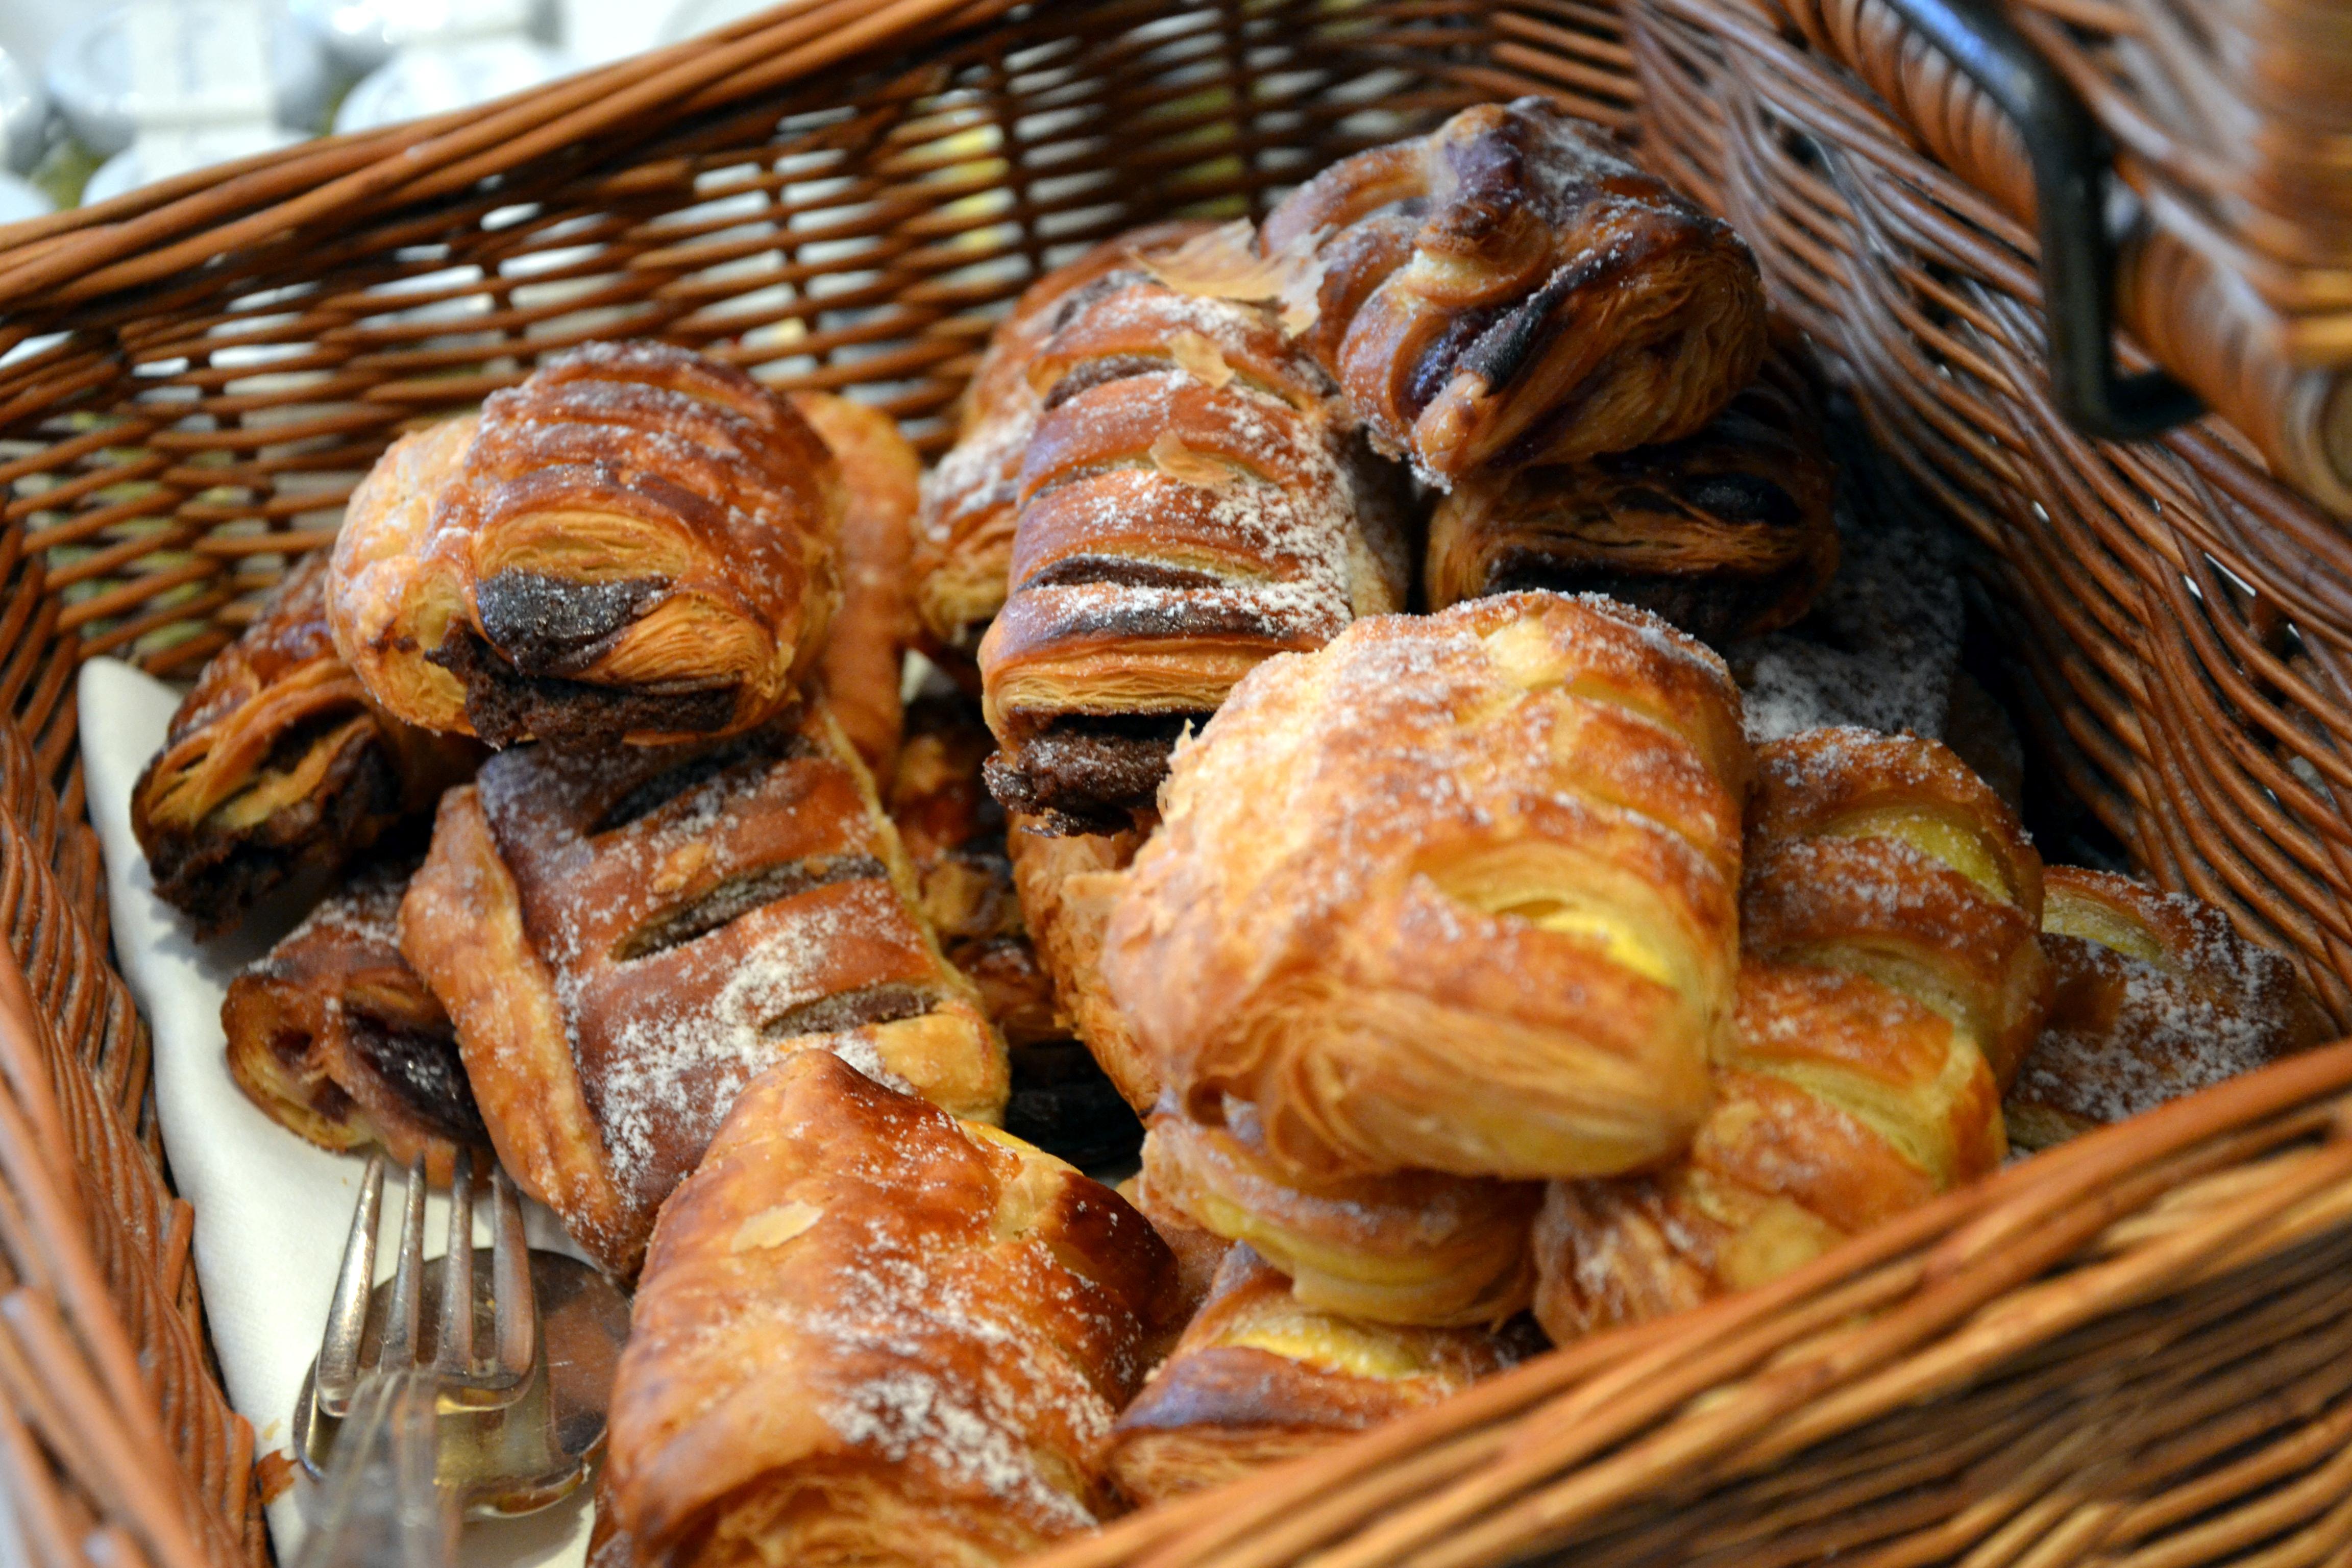 Stuttgart aufgepasst: Morgen startet das erste B2B-Commerce Frühstück